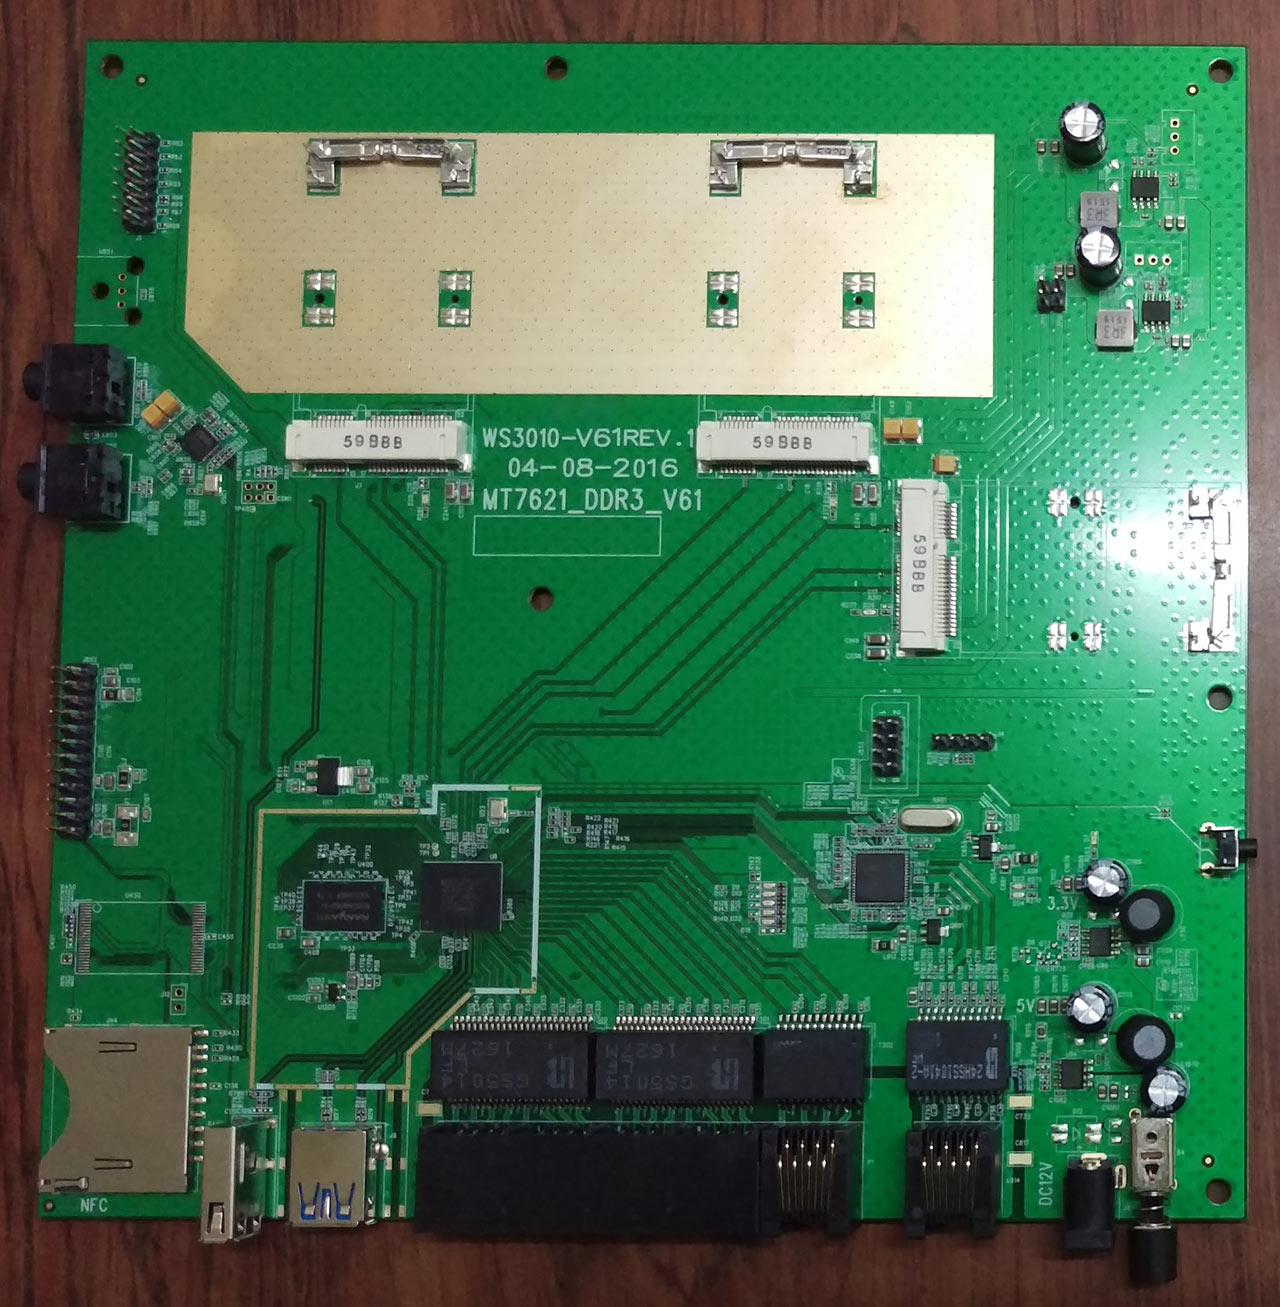 BPI-R2 with BPI-7615(based on MT7615) module development progress